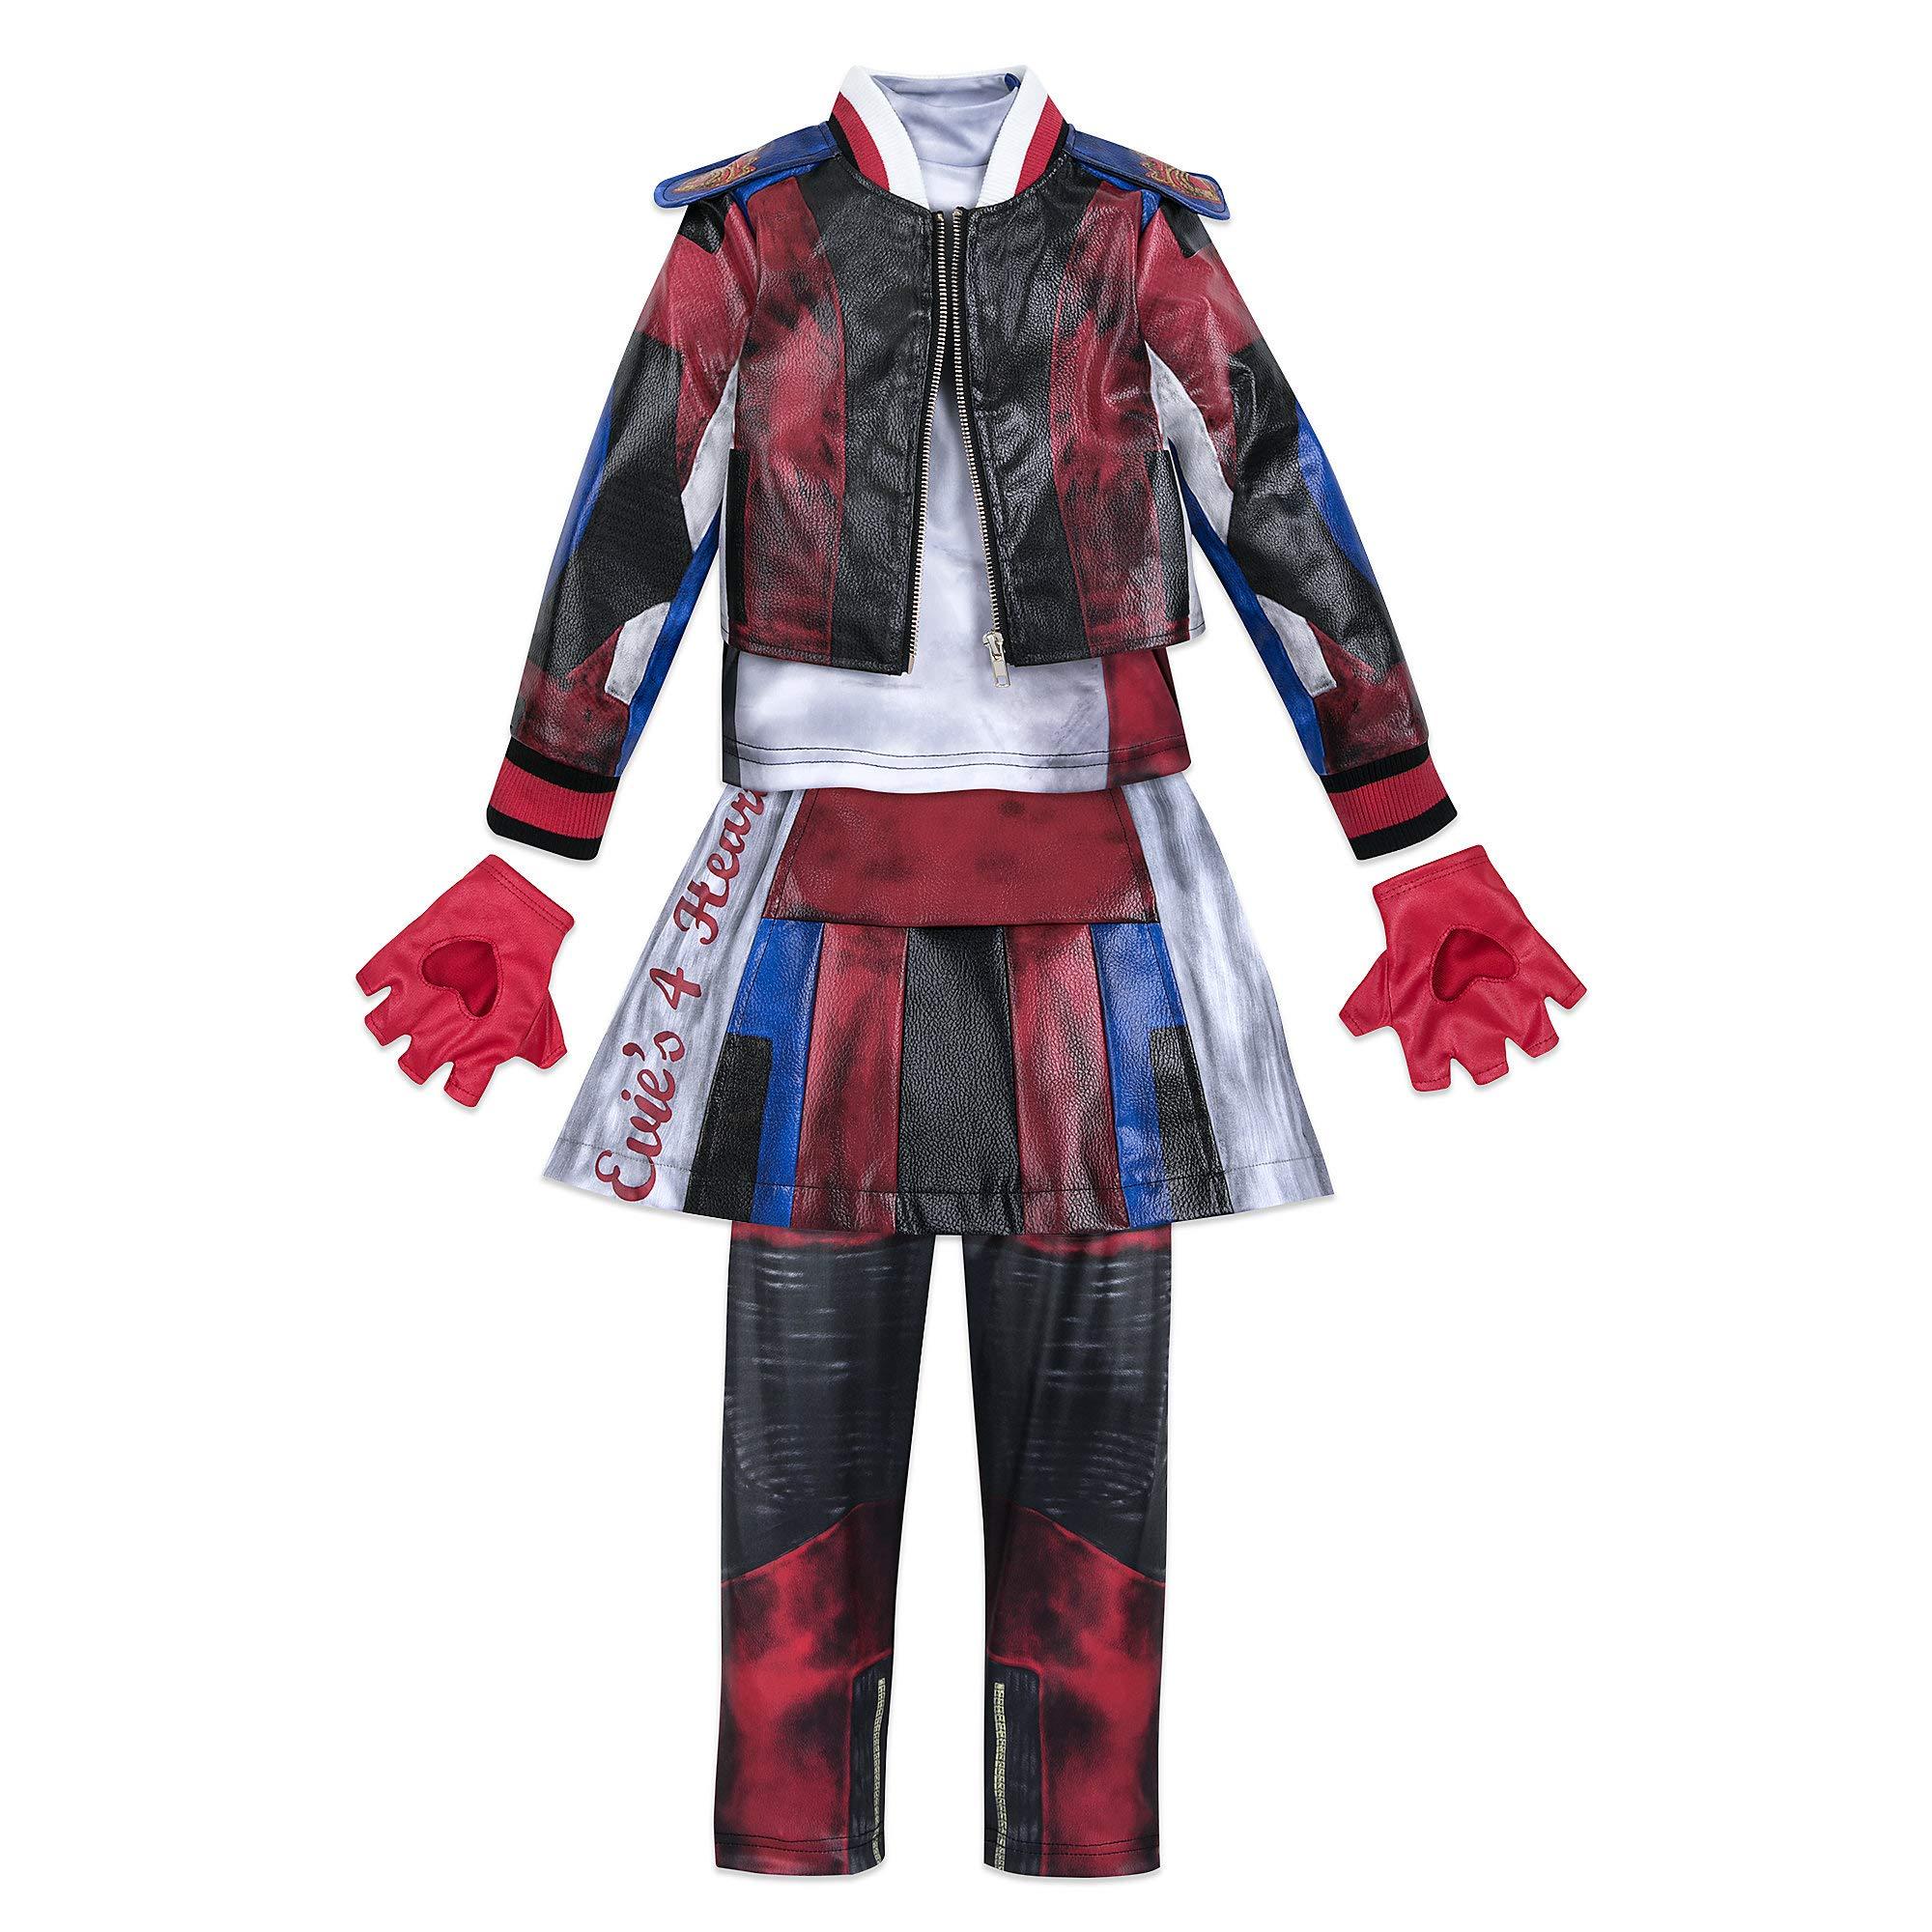 Disney Evie Costume for Kids - Descendants 3 Size 7/8 Blue